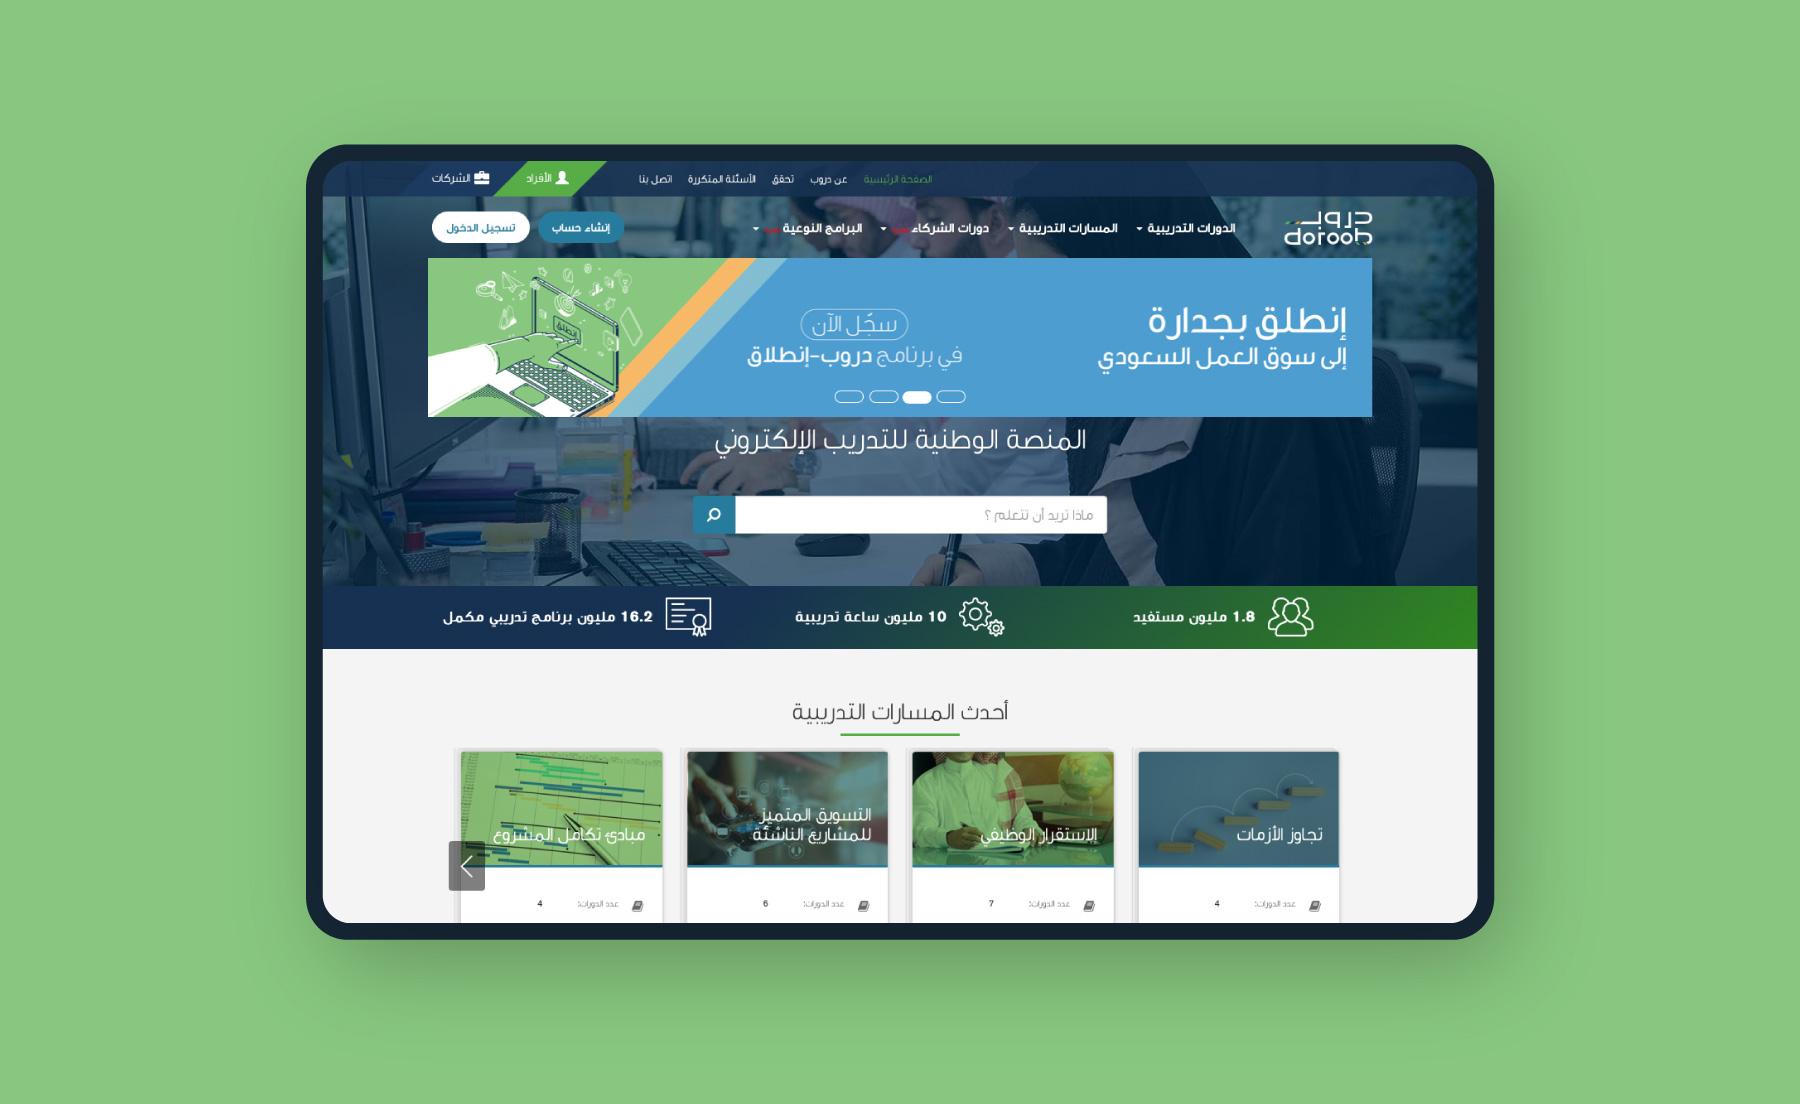 Doroob - Saudi Youth Capacity Building